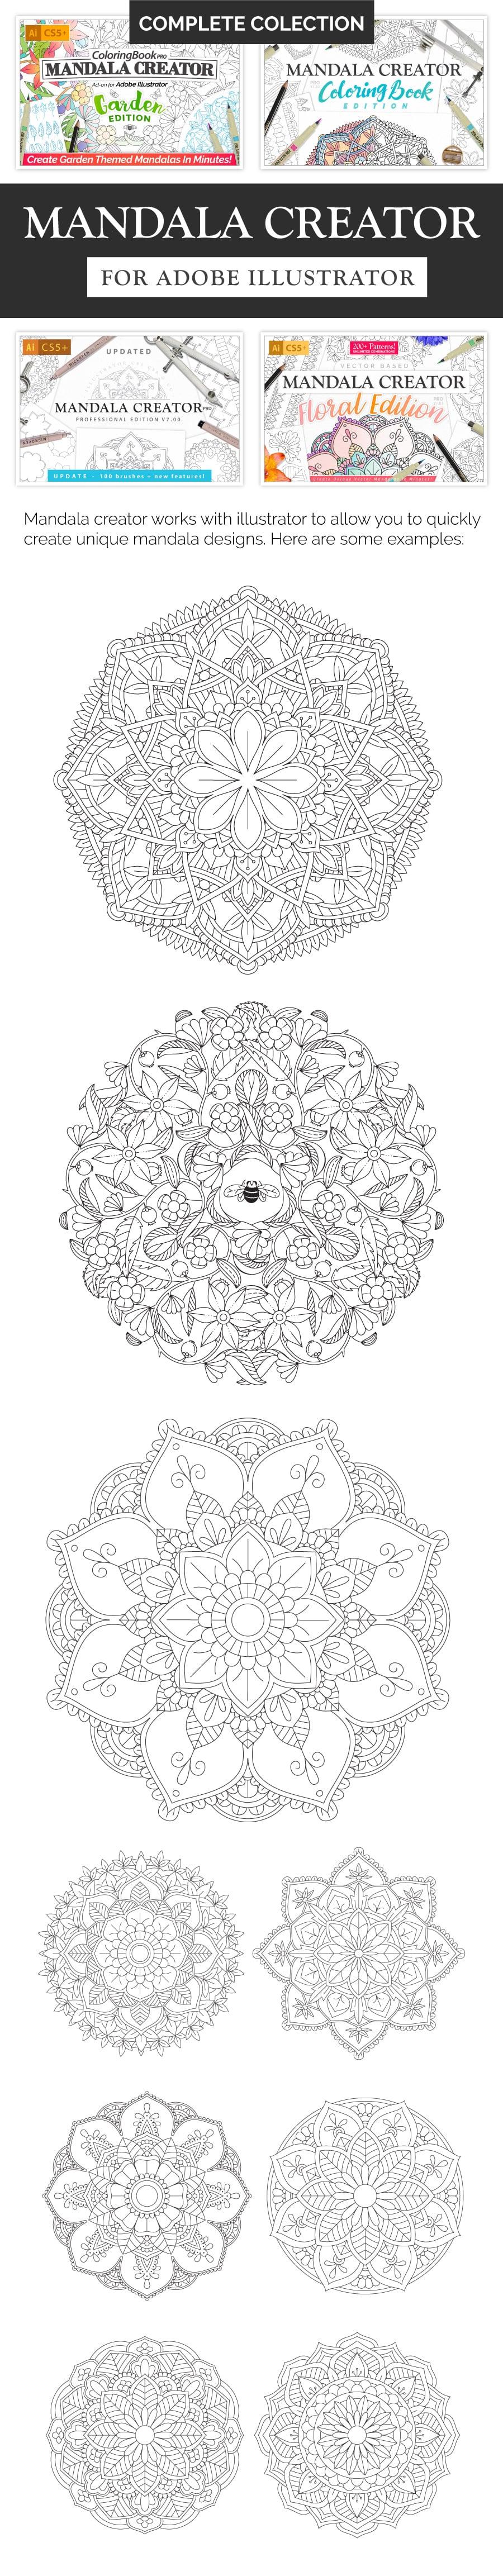 Interview with Calvin Drews a Digital Vagrant & Travelling Illustrator - Mandala Creator long 4